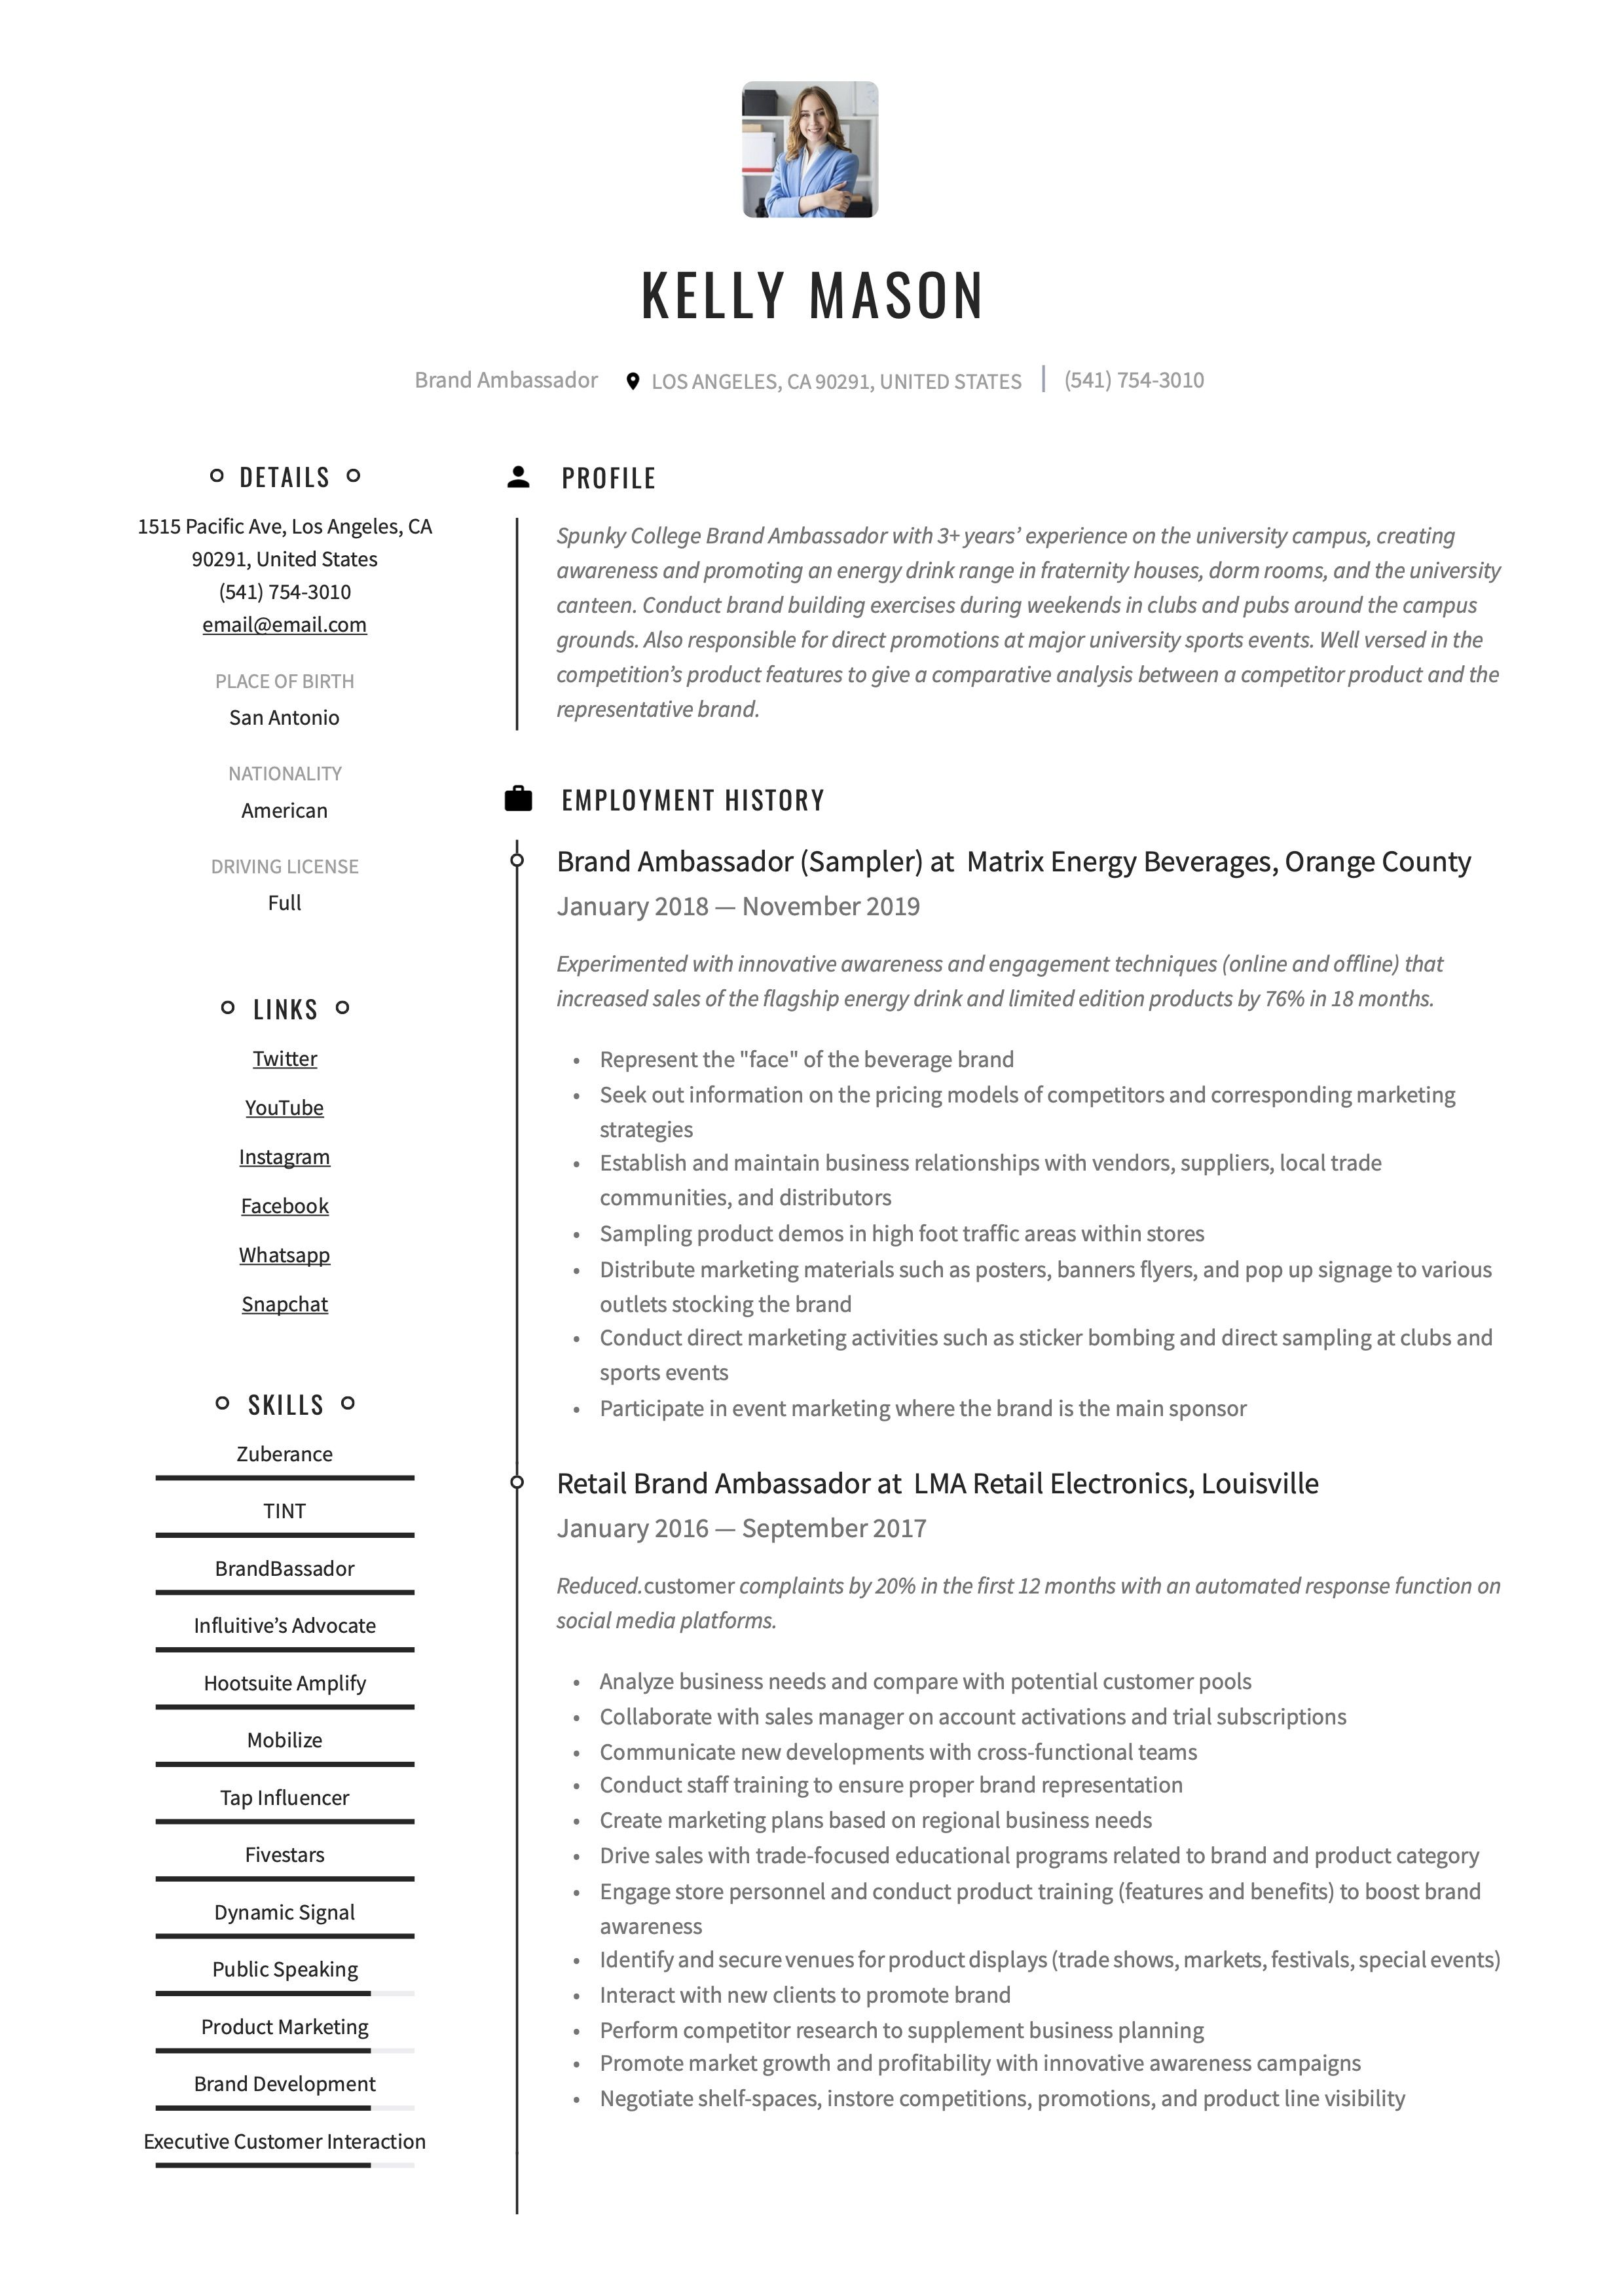 Professional Brand Ambassador Resume, template, design